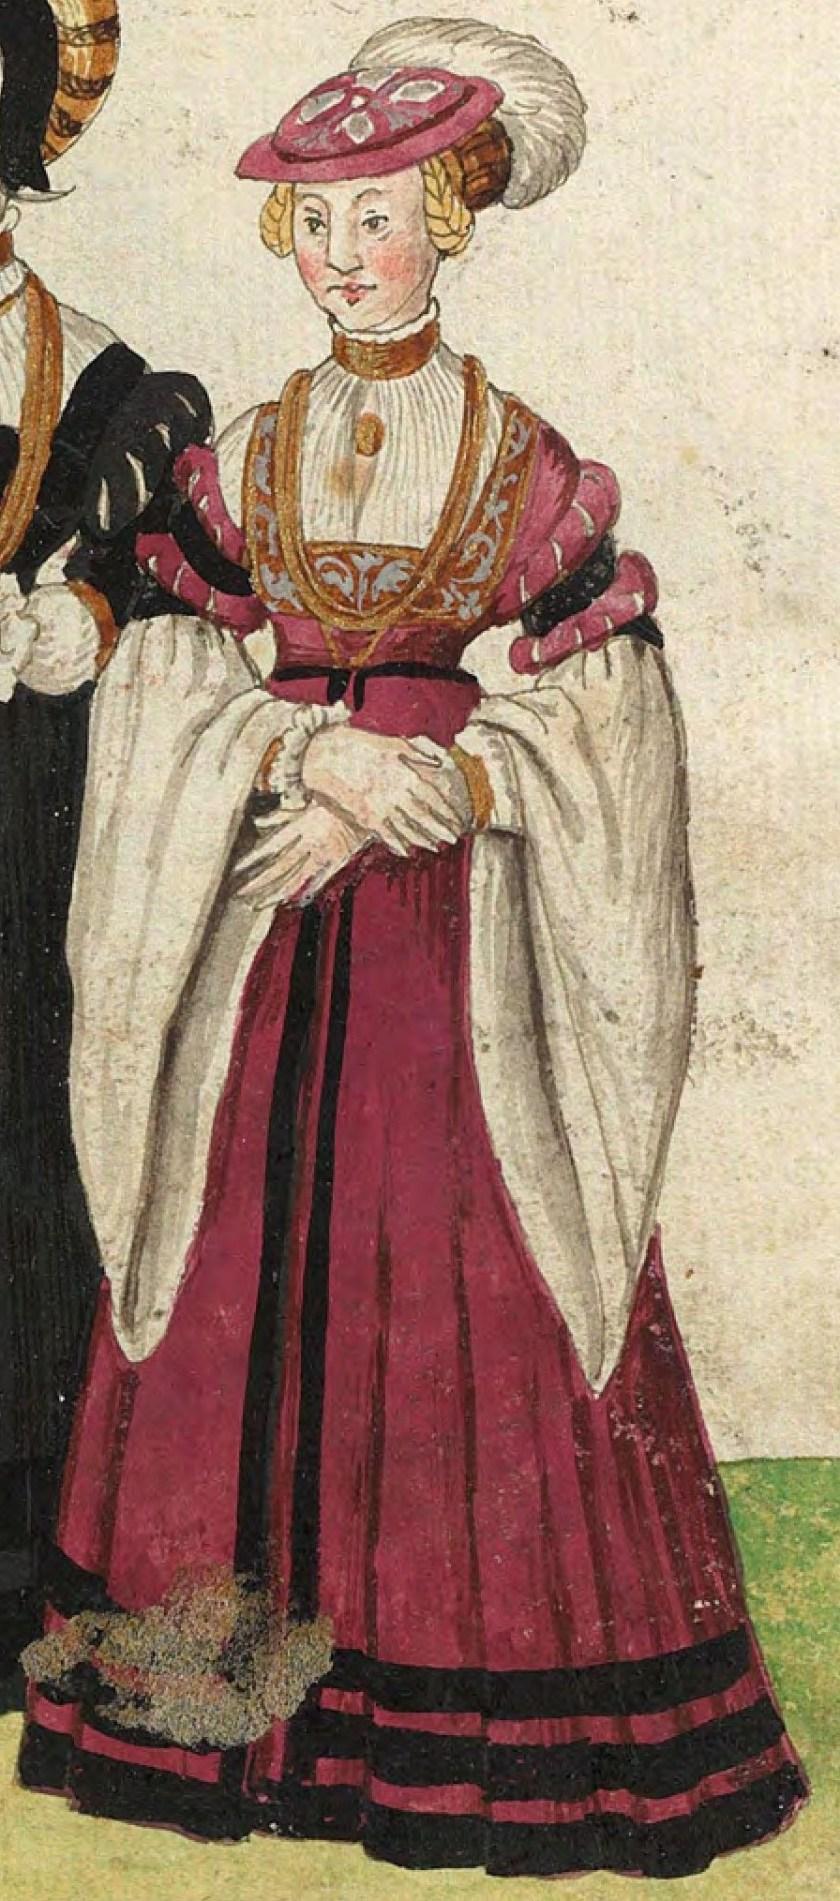 1540s Julich citizen. Fig. 3, plate 43r, Codice de trajes, Christoph Weiditz. BNE bdh0000052132